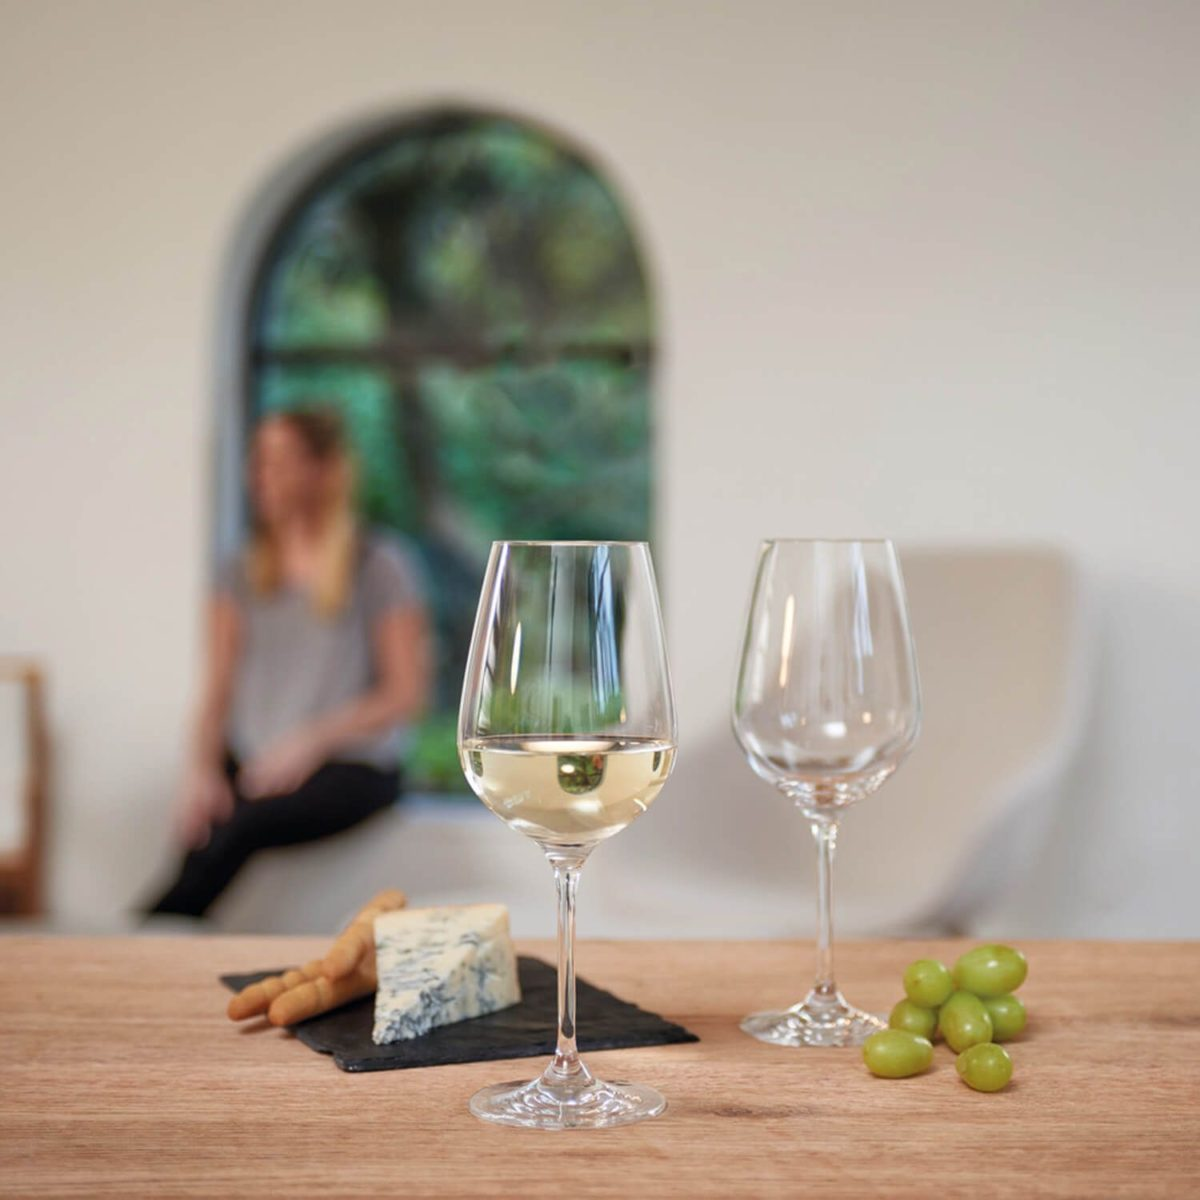 020963 3 k 1200x1200 - Pahar pentru vin alb Tivoli 450 ml (L020963)